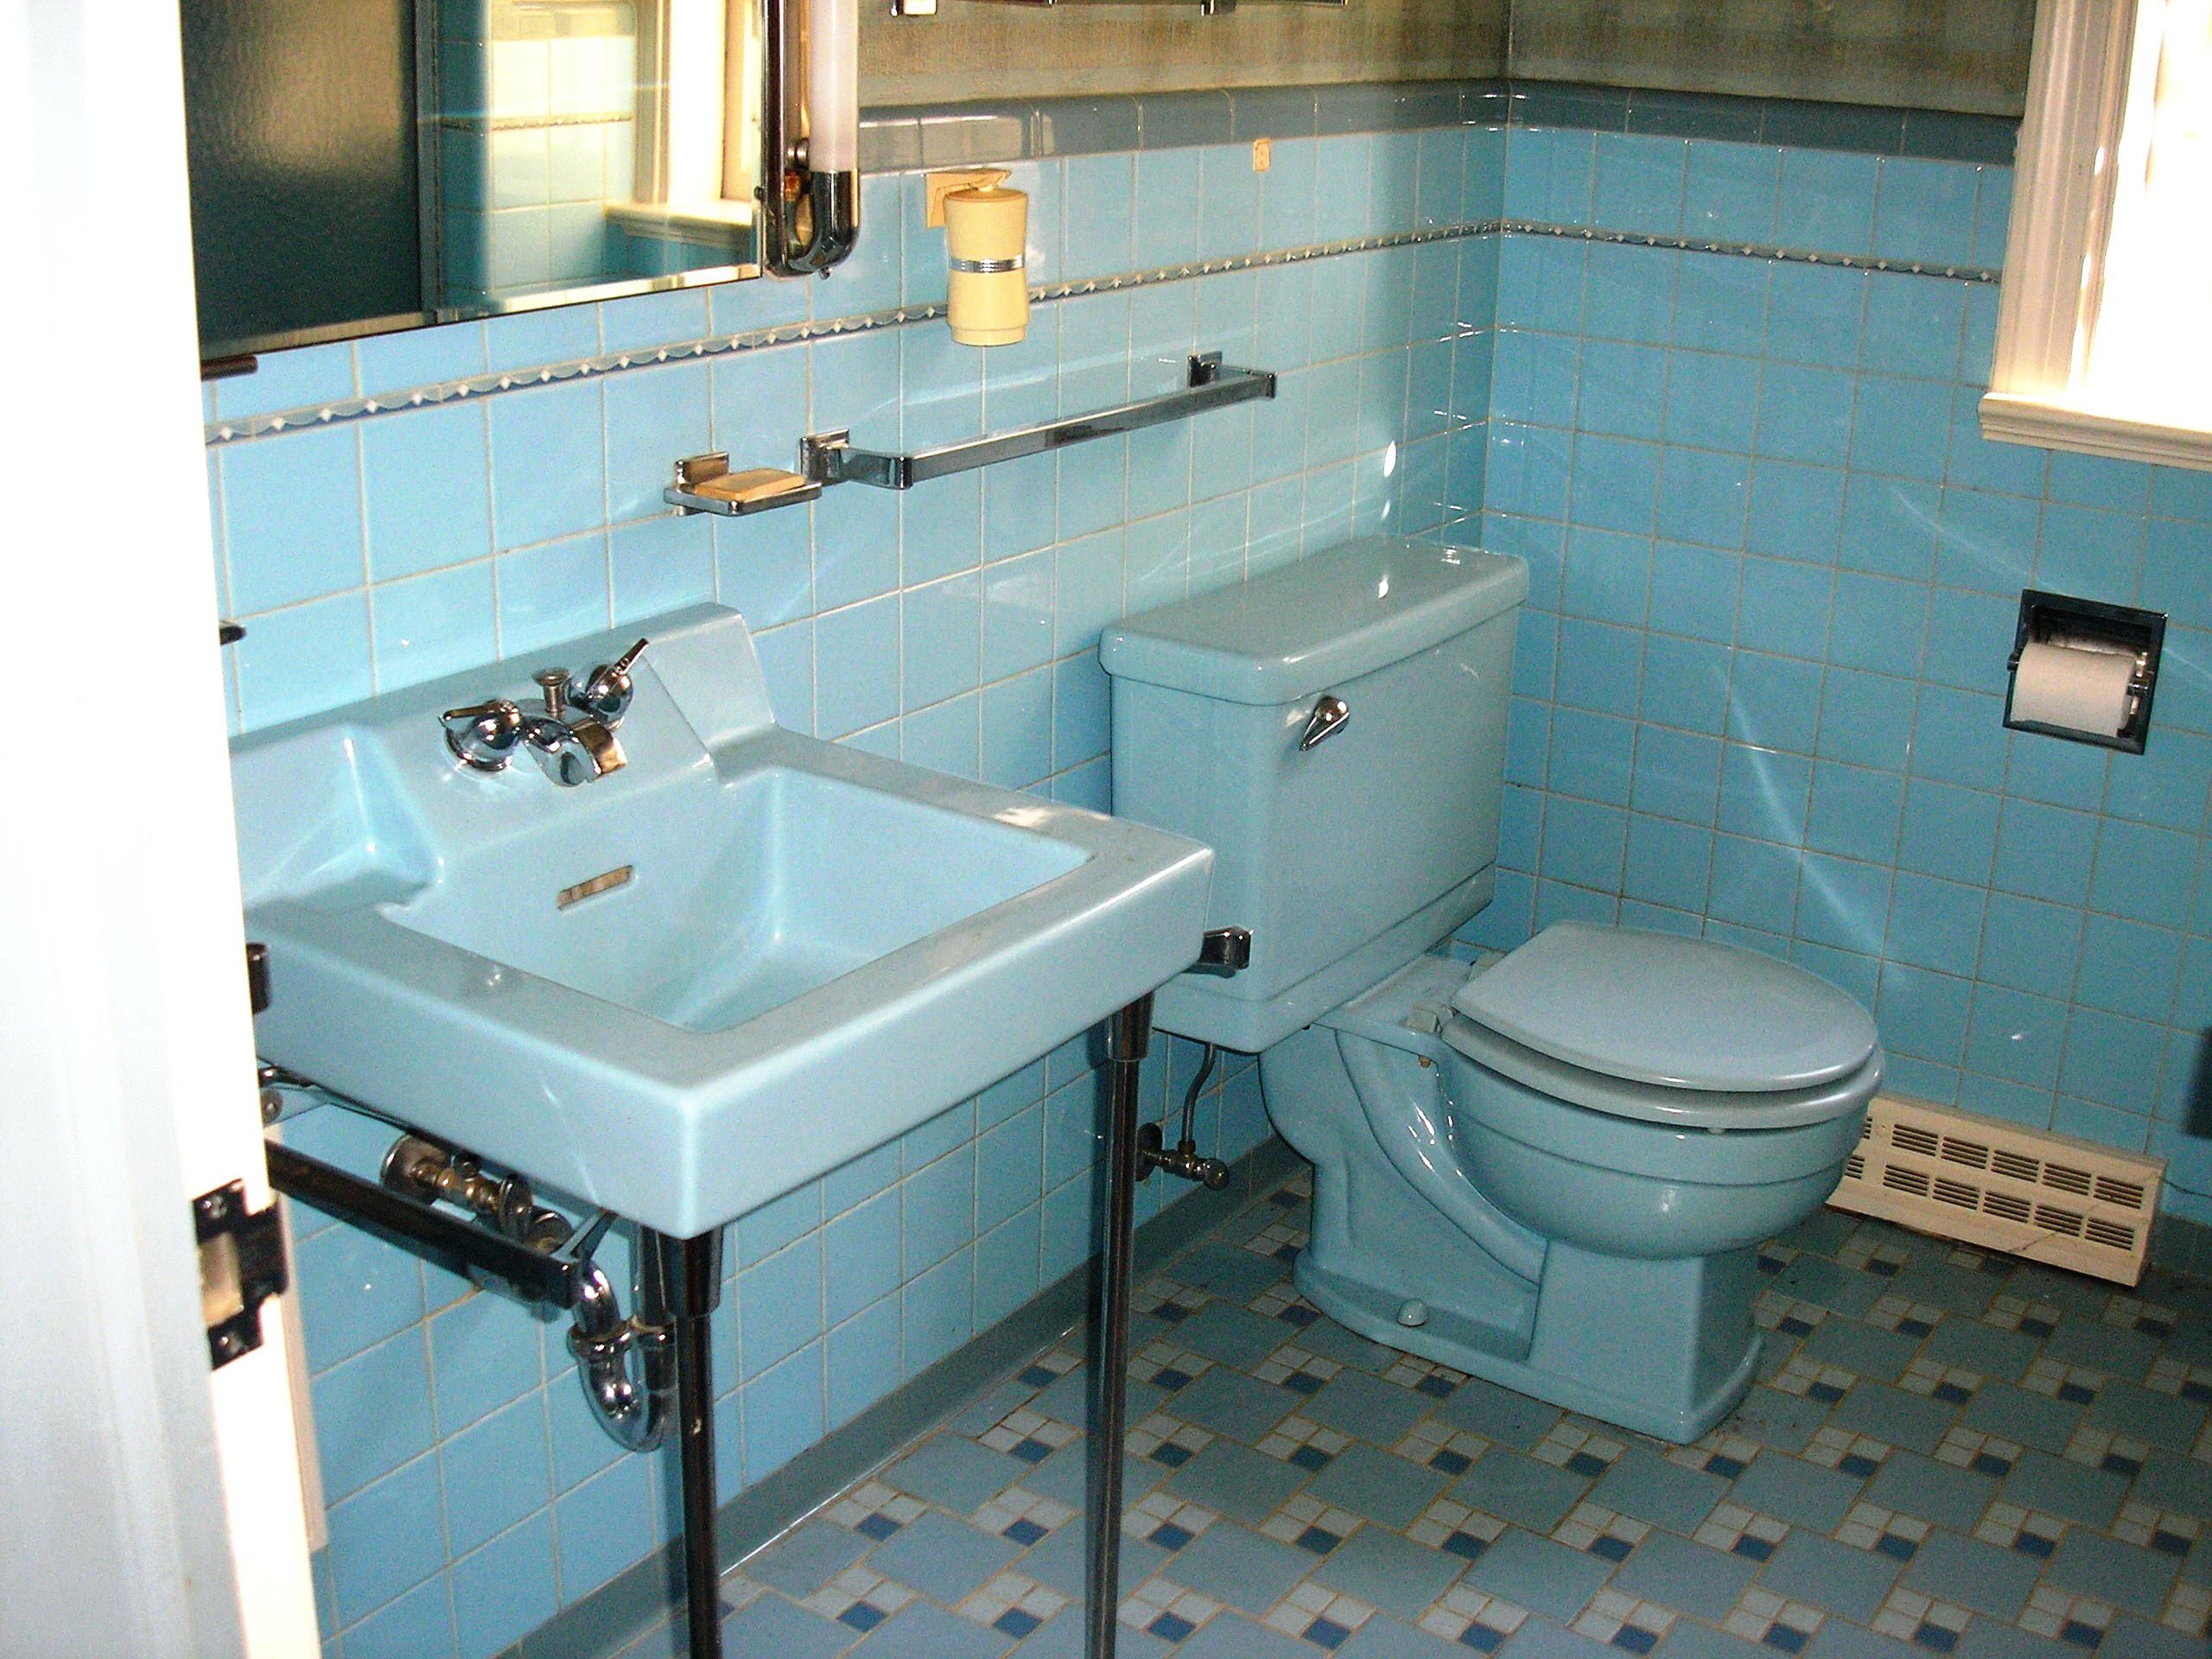 1950s Bathroom Replicating Alices Blue 50s Tile Floor Retro  Renovationvintage Patterns Vintage Company